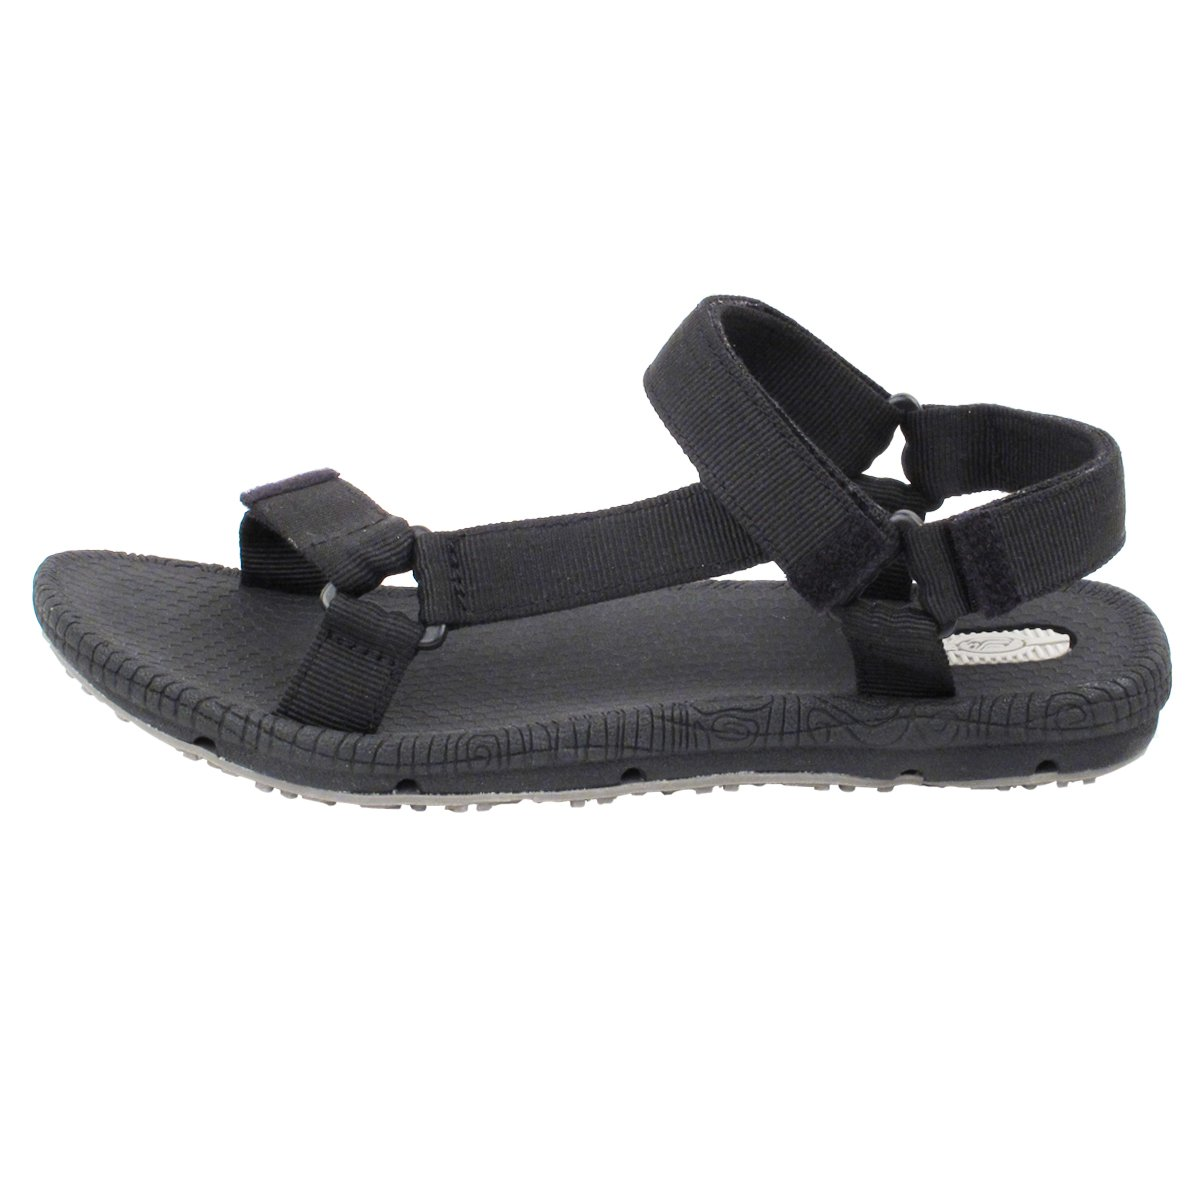 Gold Pigeon Shoes GP5931 Light Weight Adjustable Outdoor Water Sling Back Sandals for Men & Women B01N4PINA7 EU40: Women 9.5/10 & Men 8/8.5 (266mm)|Black